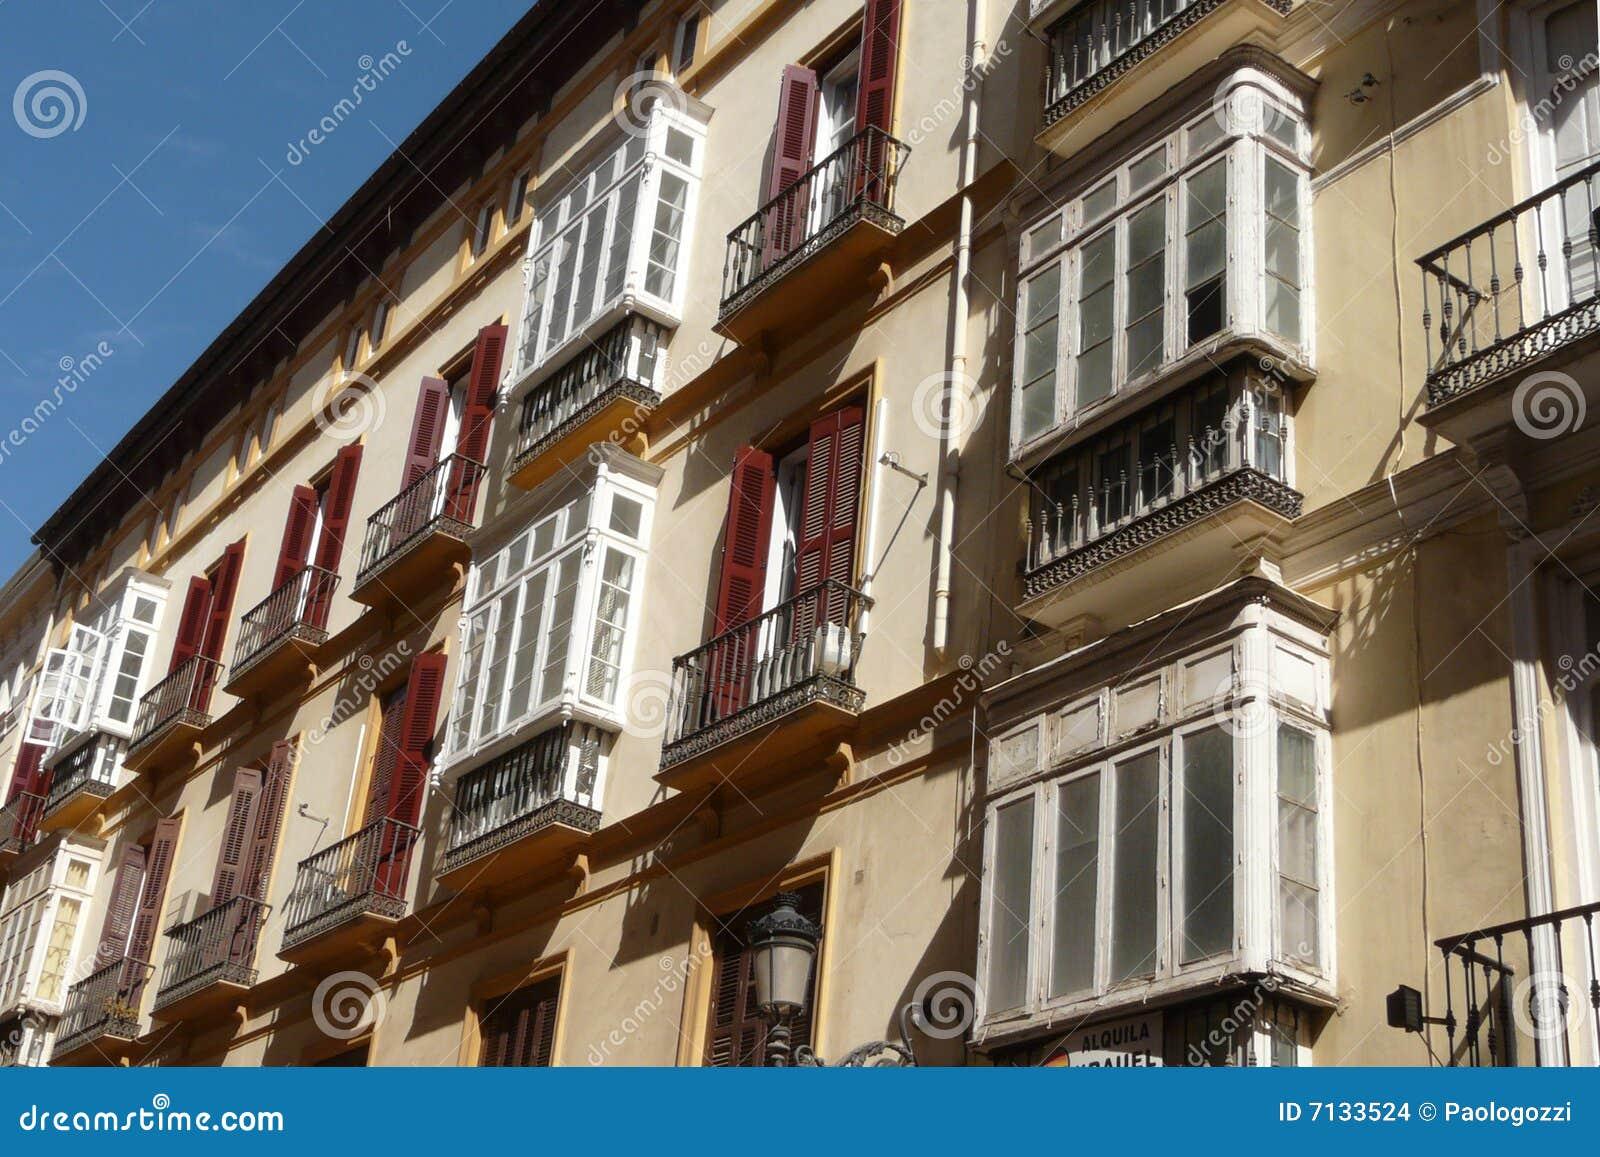 Old Malaga s buildings